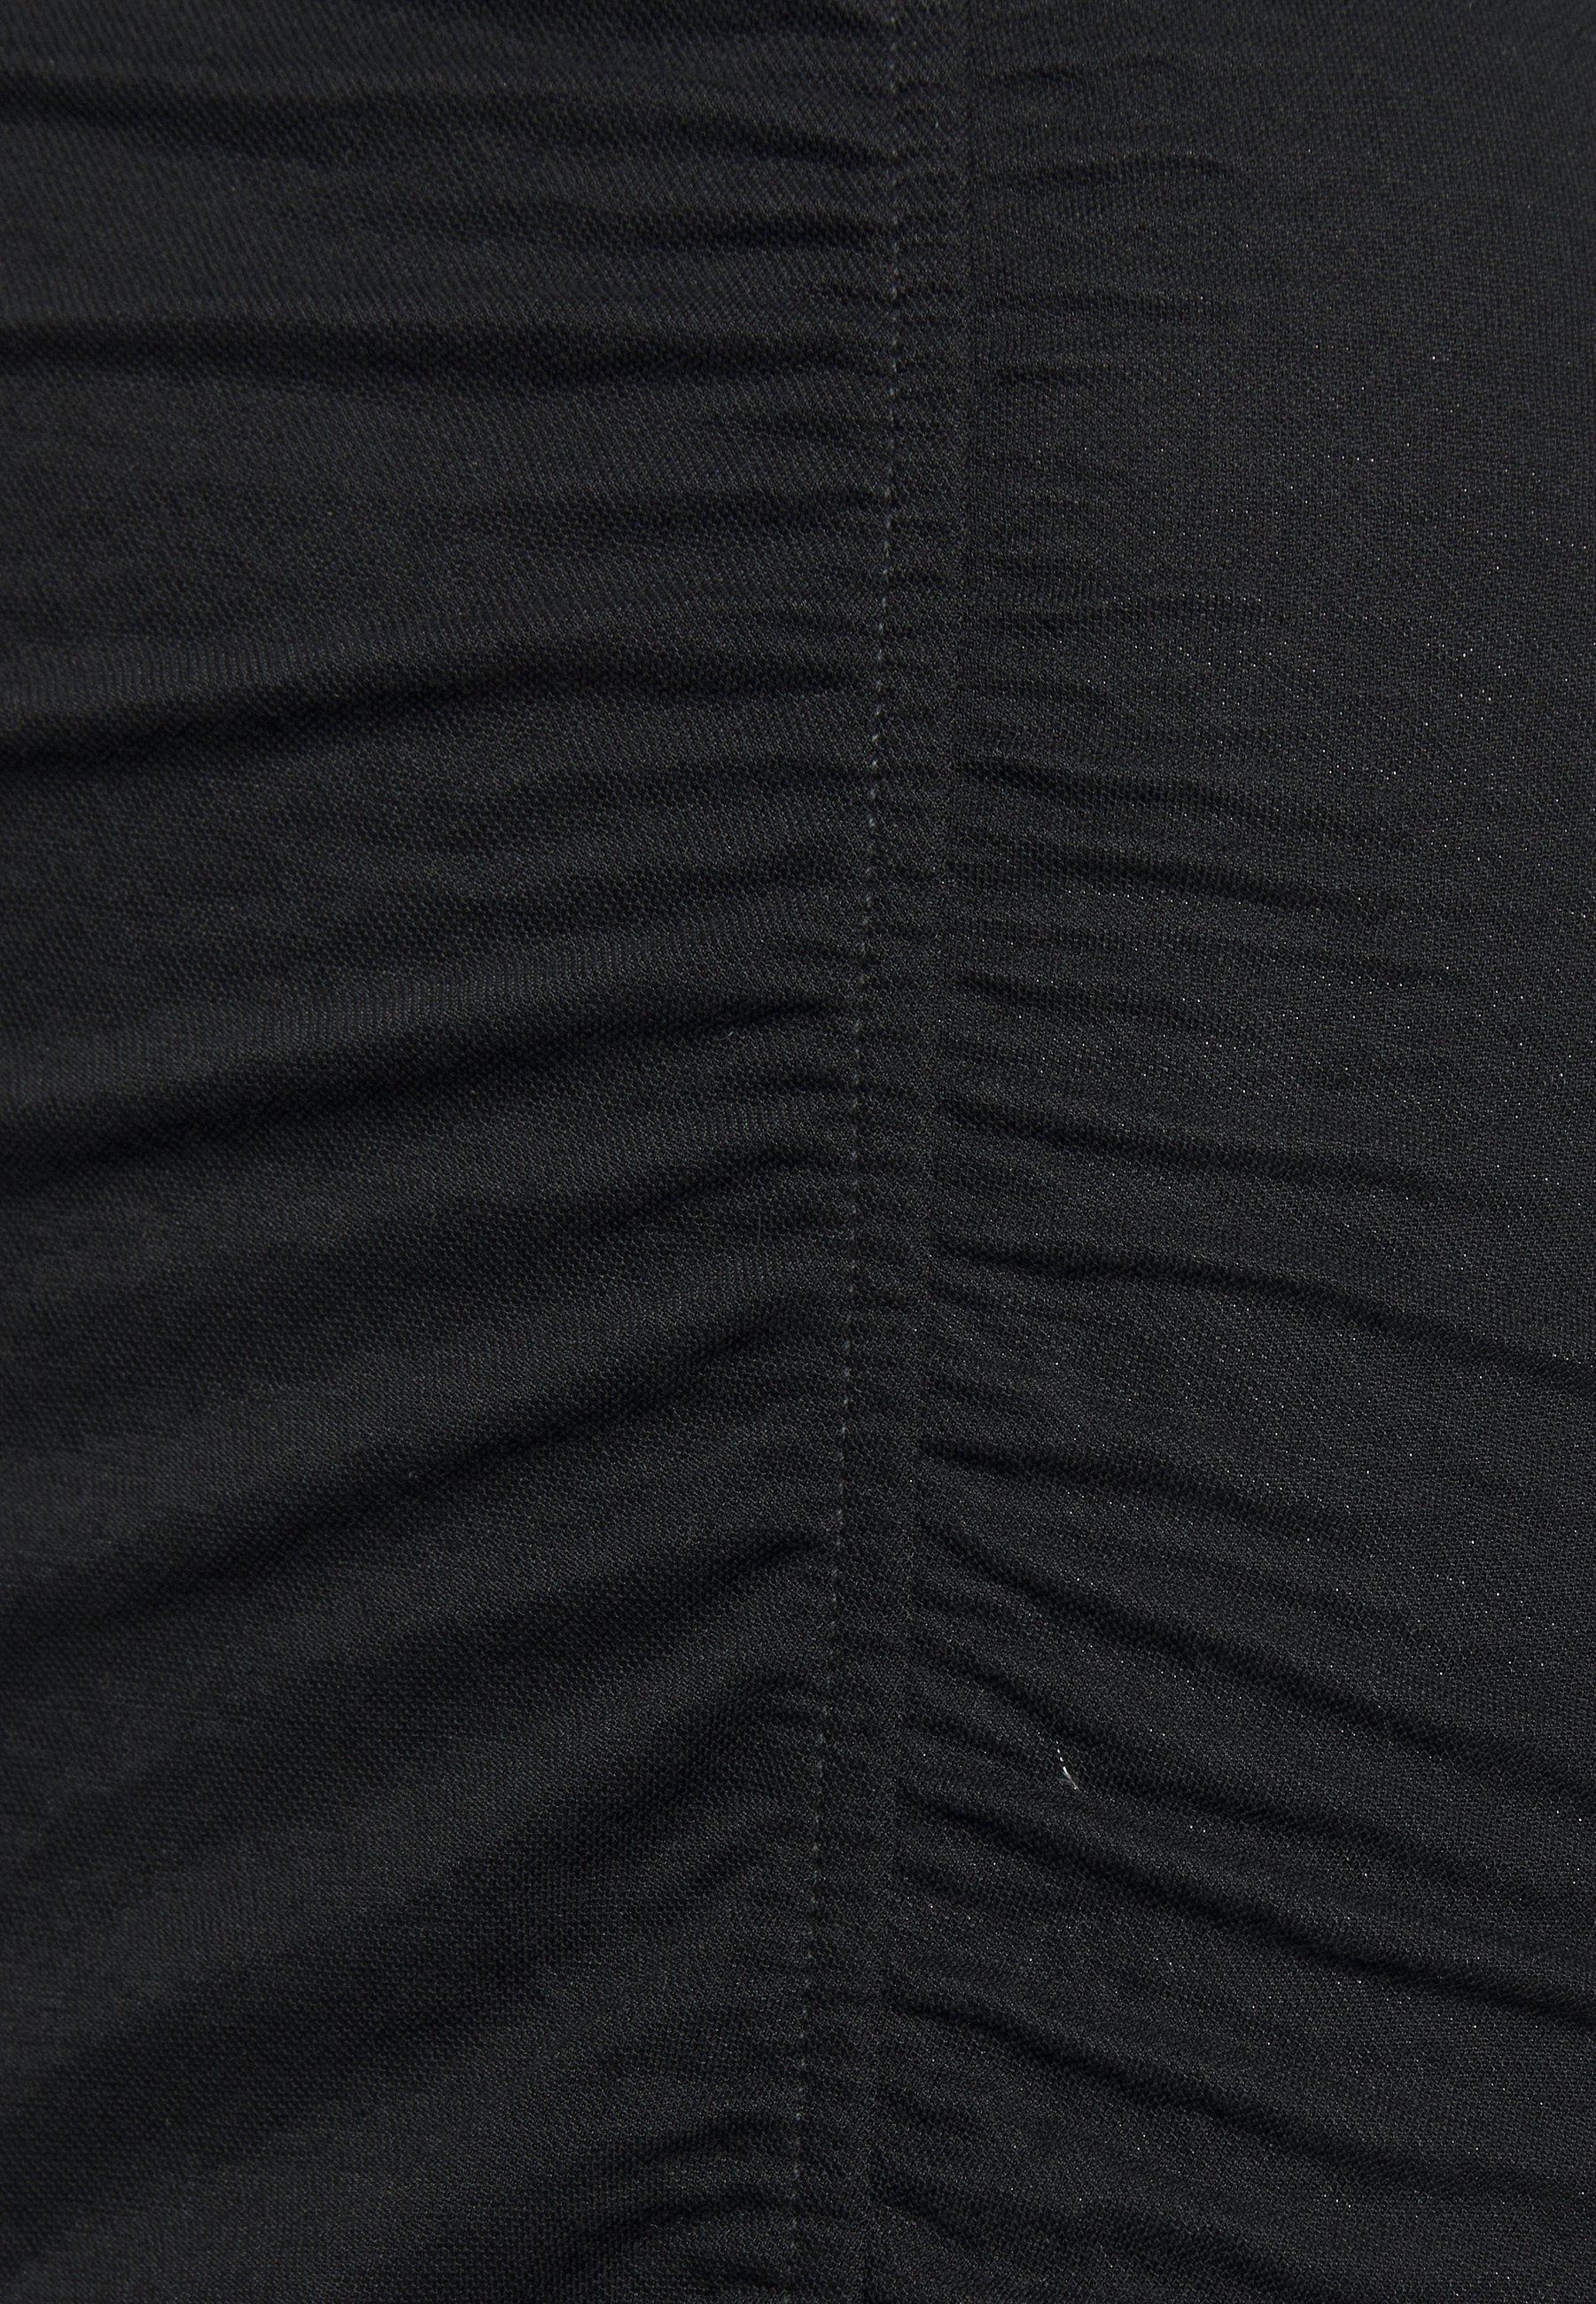 Mujer ANNIE SKIRT - Minifalda - black